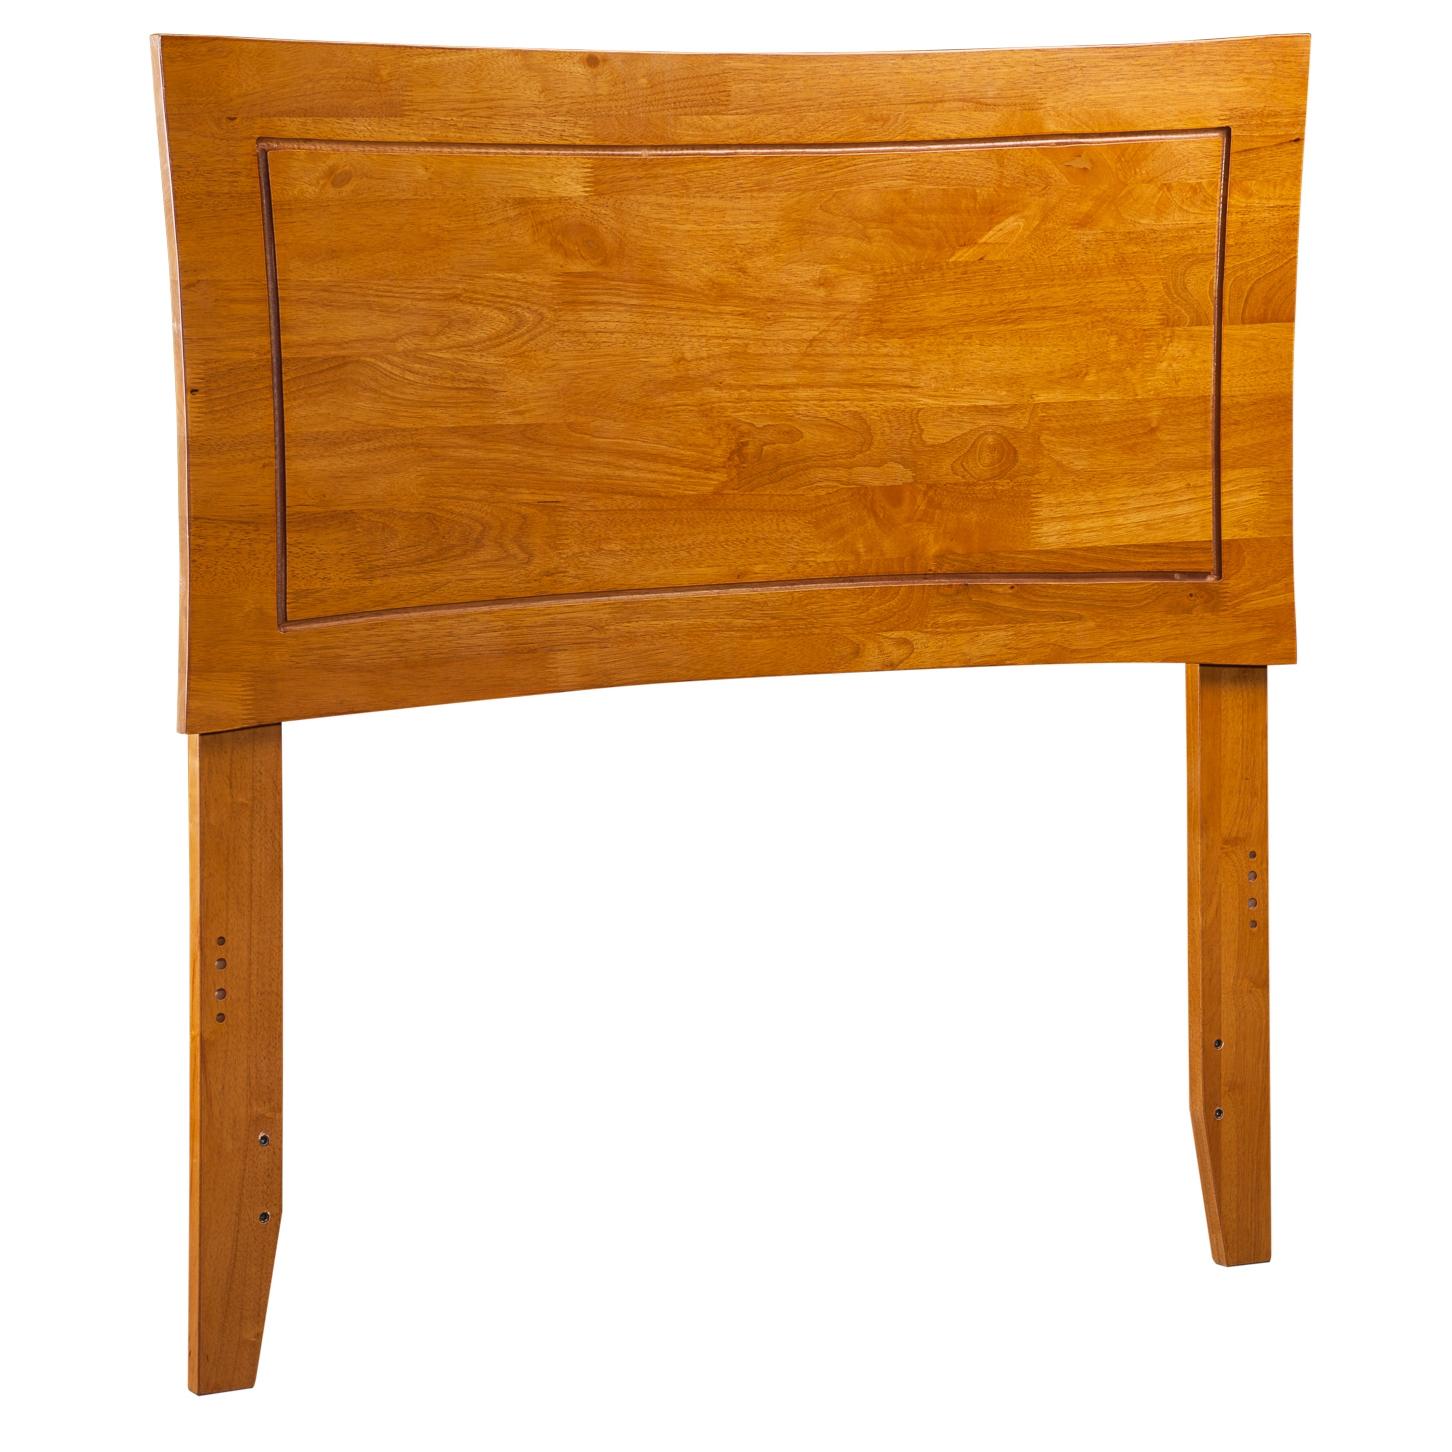 Atlantic Furniture 42.75 in Twin Headboard in Espresso Finish